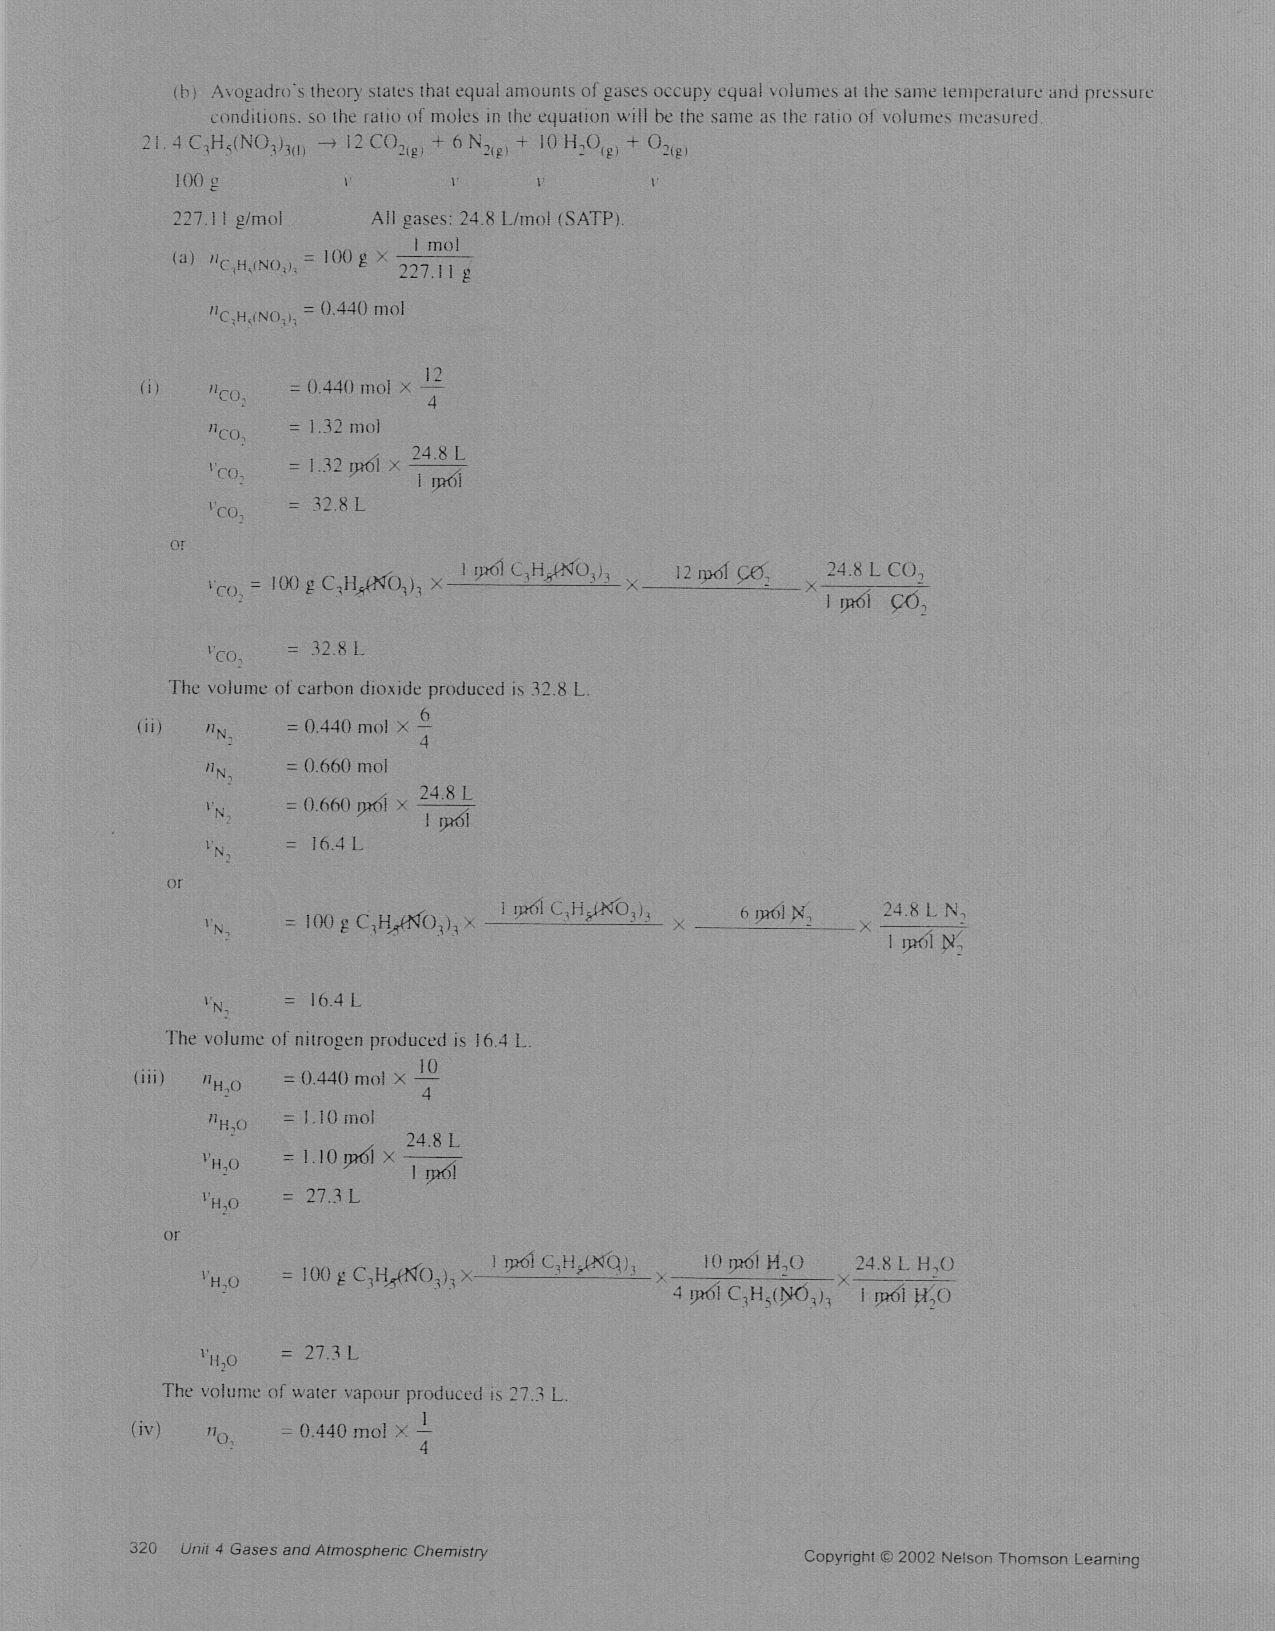 worksheet Determining The Formula Of A Hydrate Chem Worksheet 11 6 mathball grade 11 chemistry sem 1 12 13 2324 26